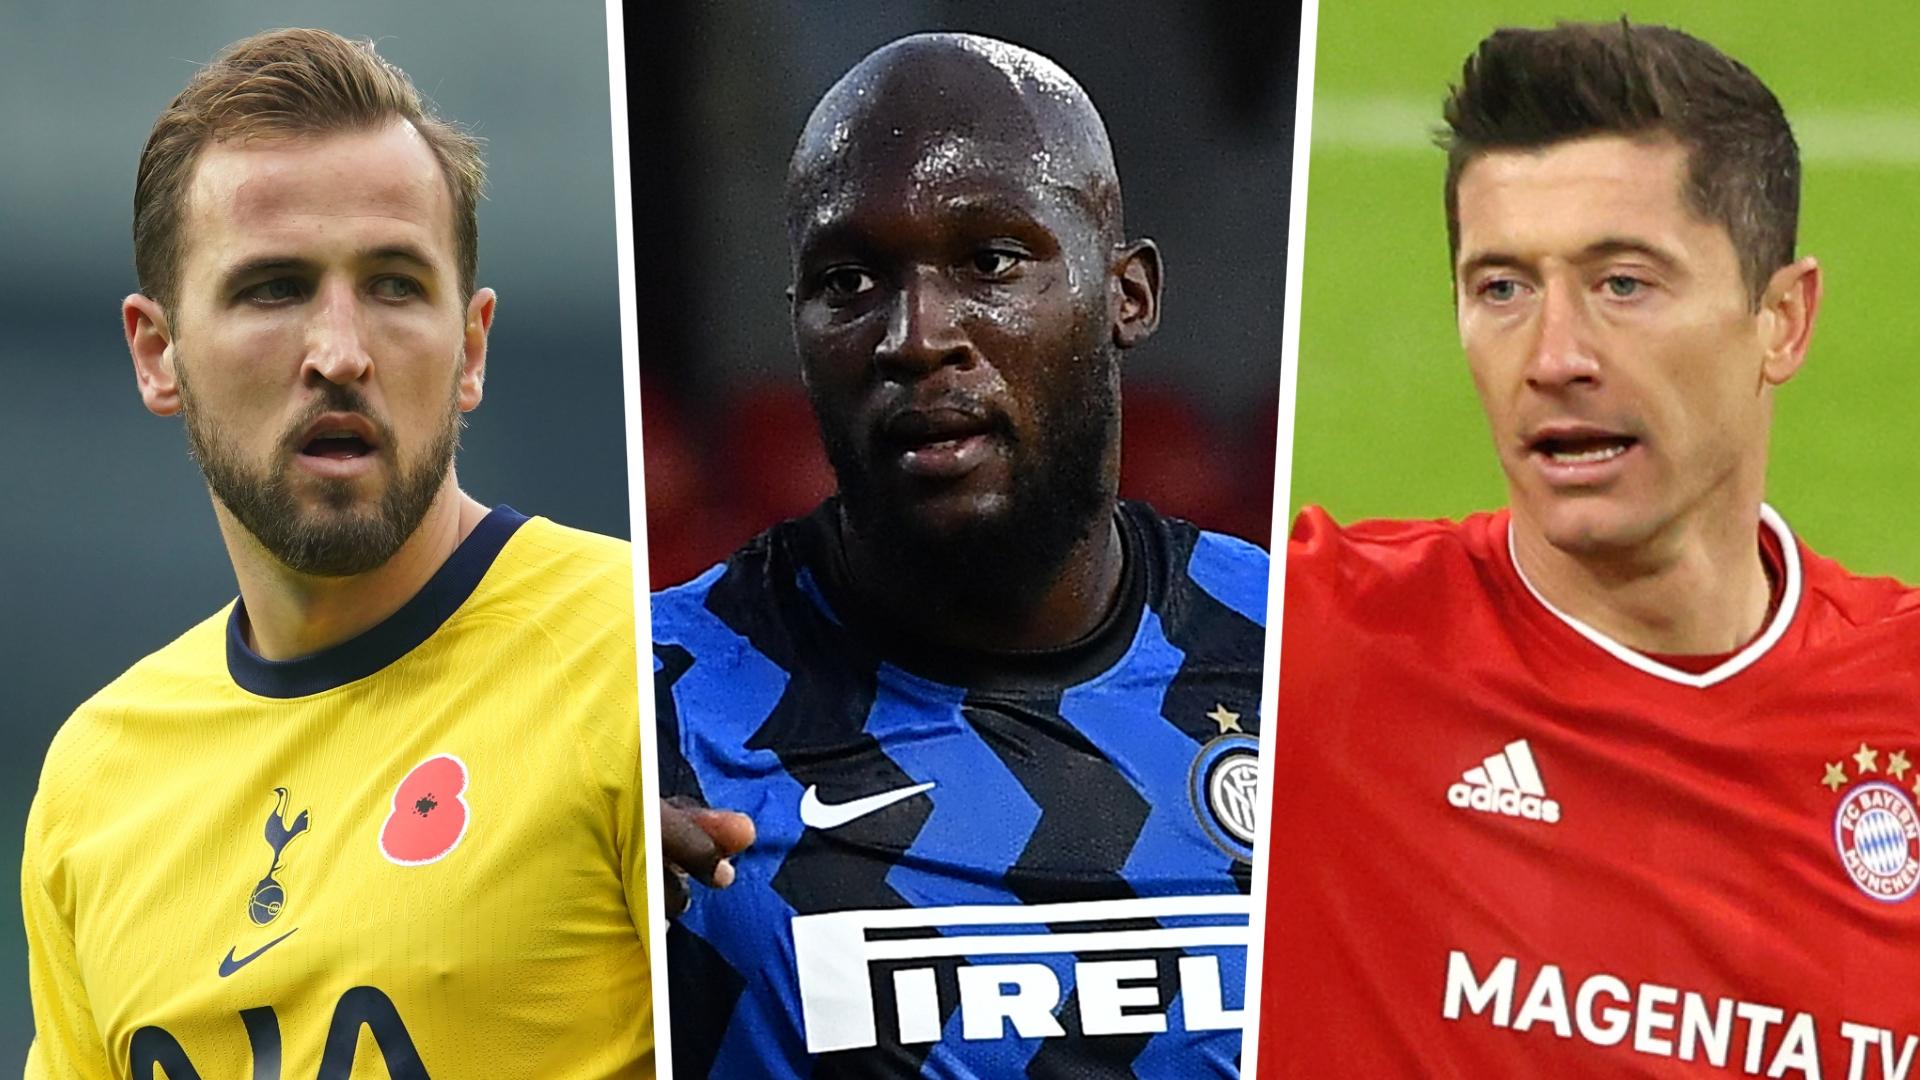 Lukaku billed as 'better than Kane' as former Inter stars say Lewandowski wouldn't get as many goals